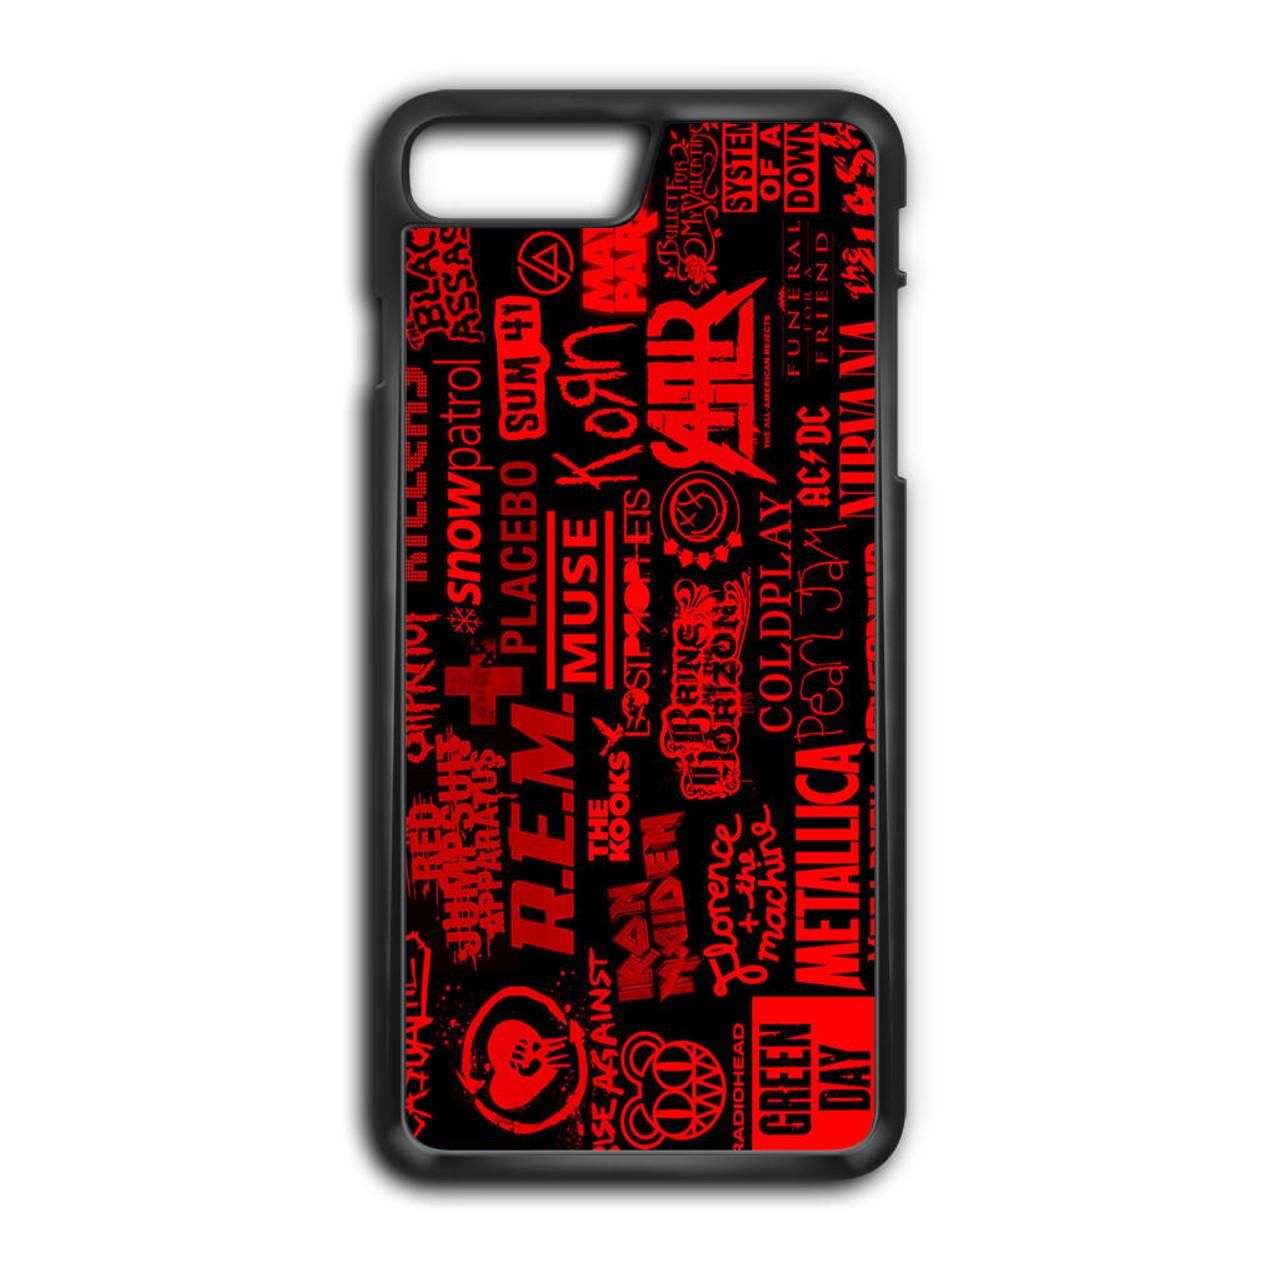 band iphone 7 plus case